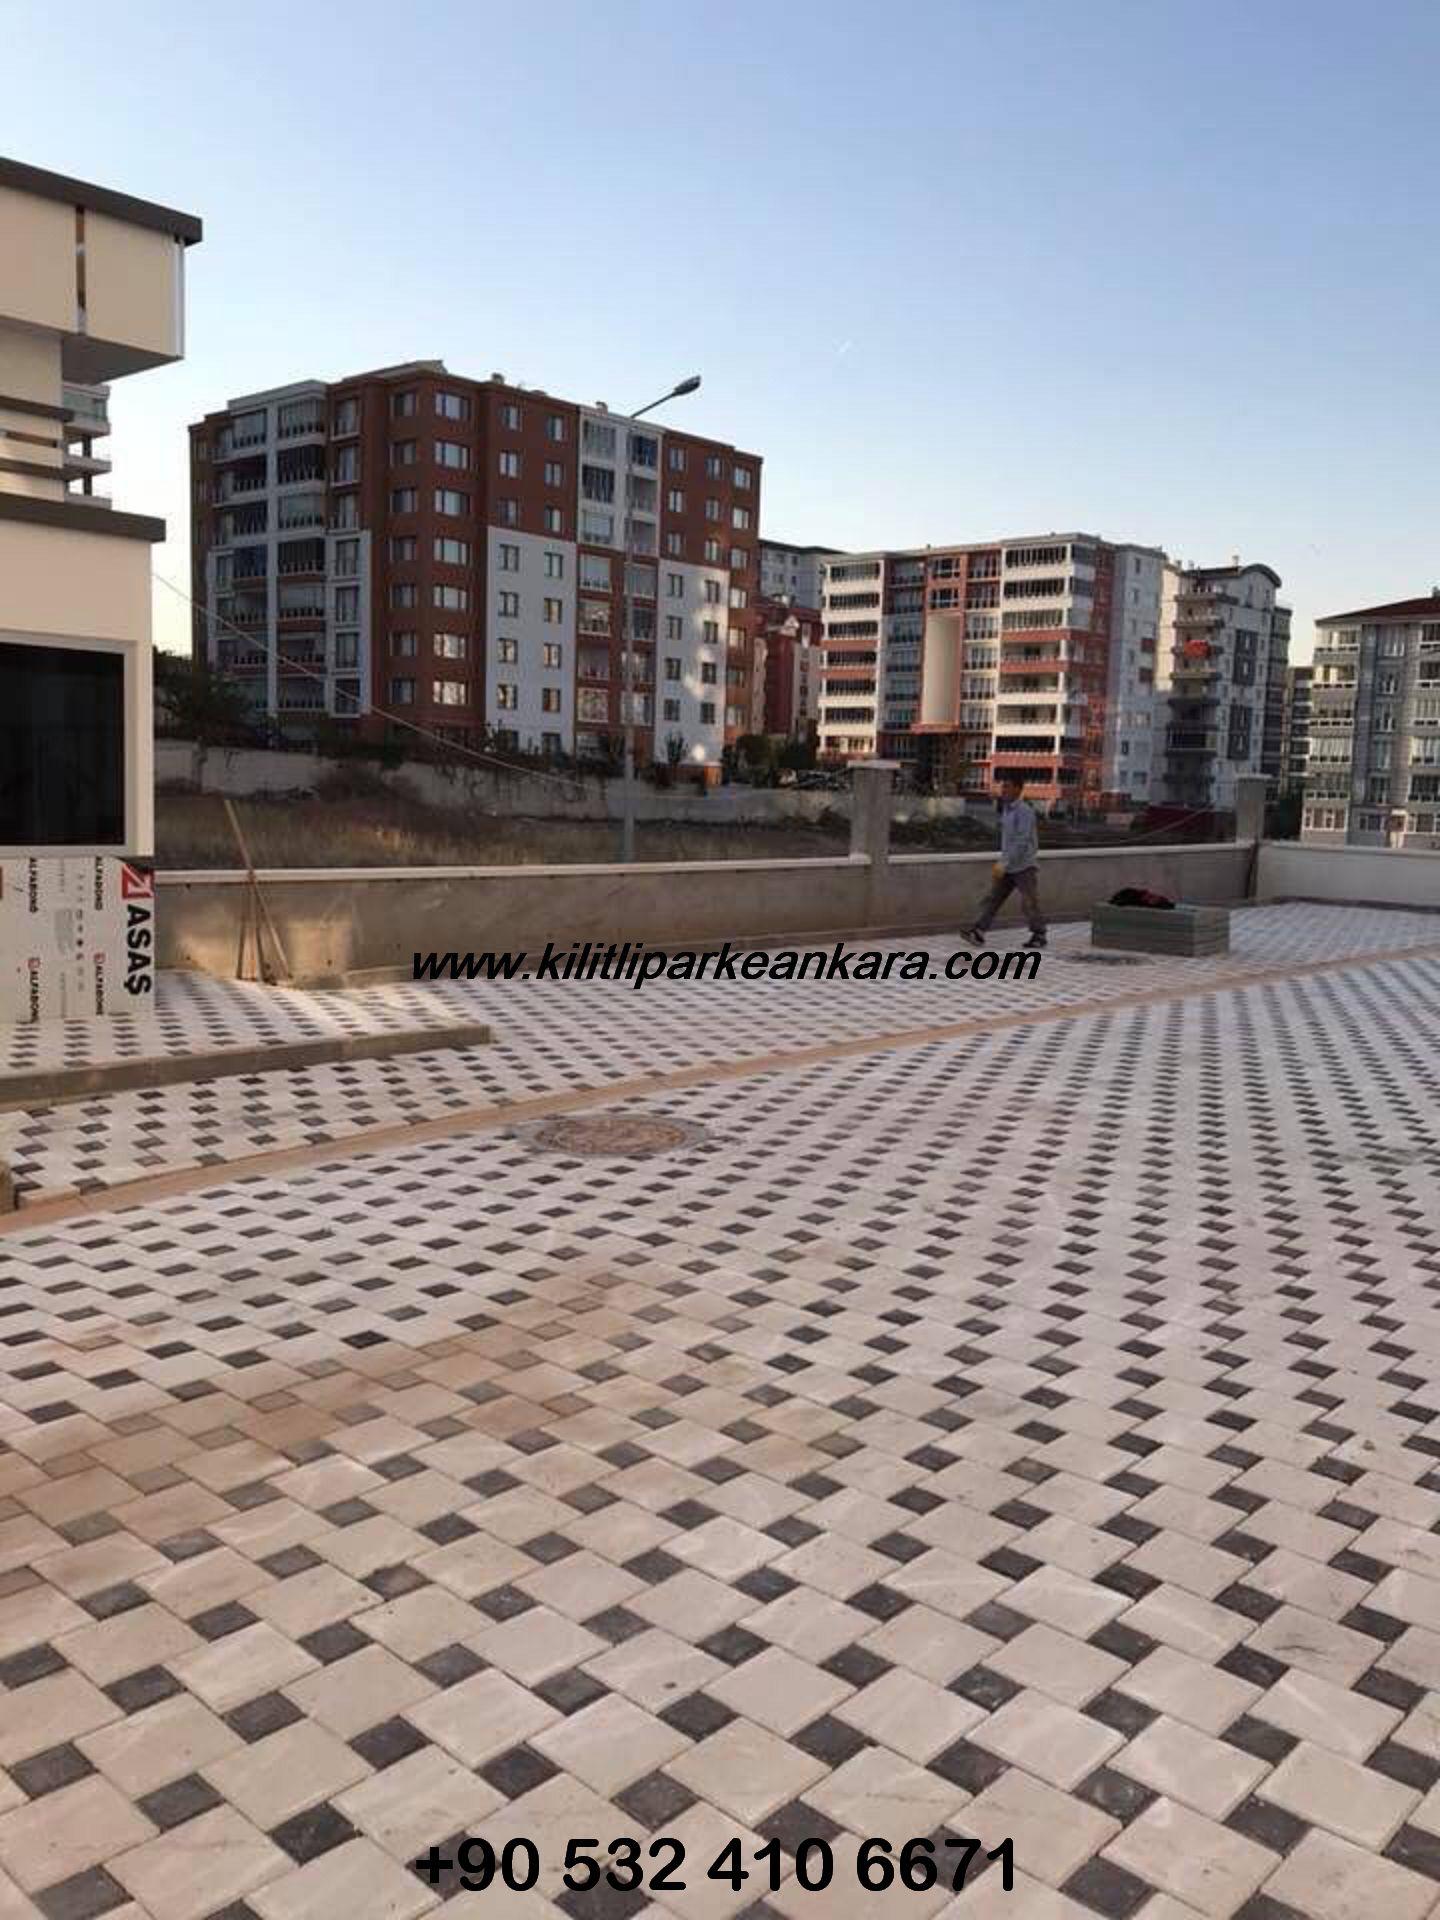 Ankara Kilit Taşı - Kilitli Parke Taşı Ustası (007)